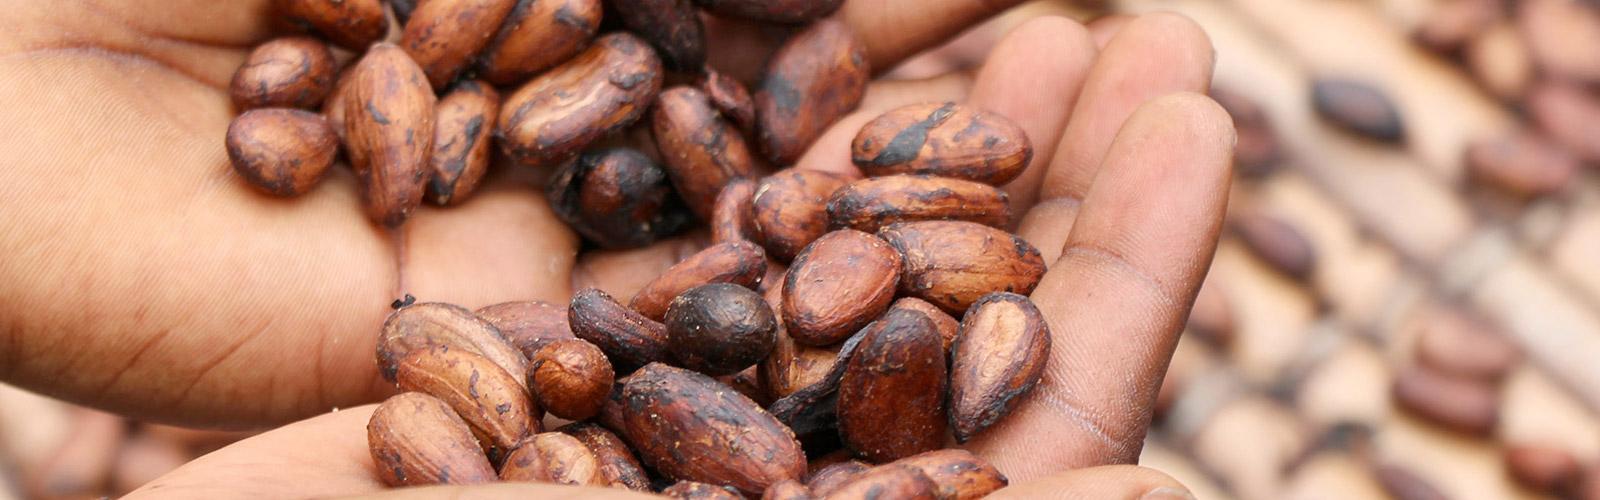 Cocoa beans, Cameroon © E. Fidele, Unsplash